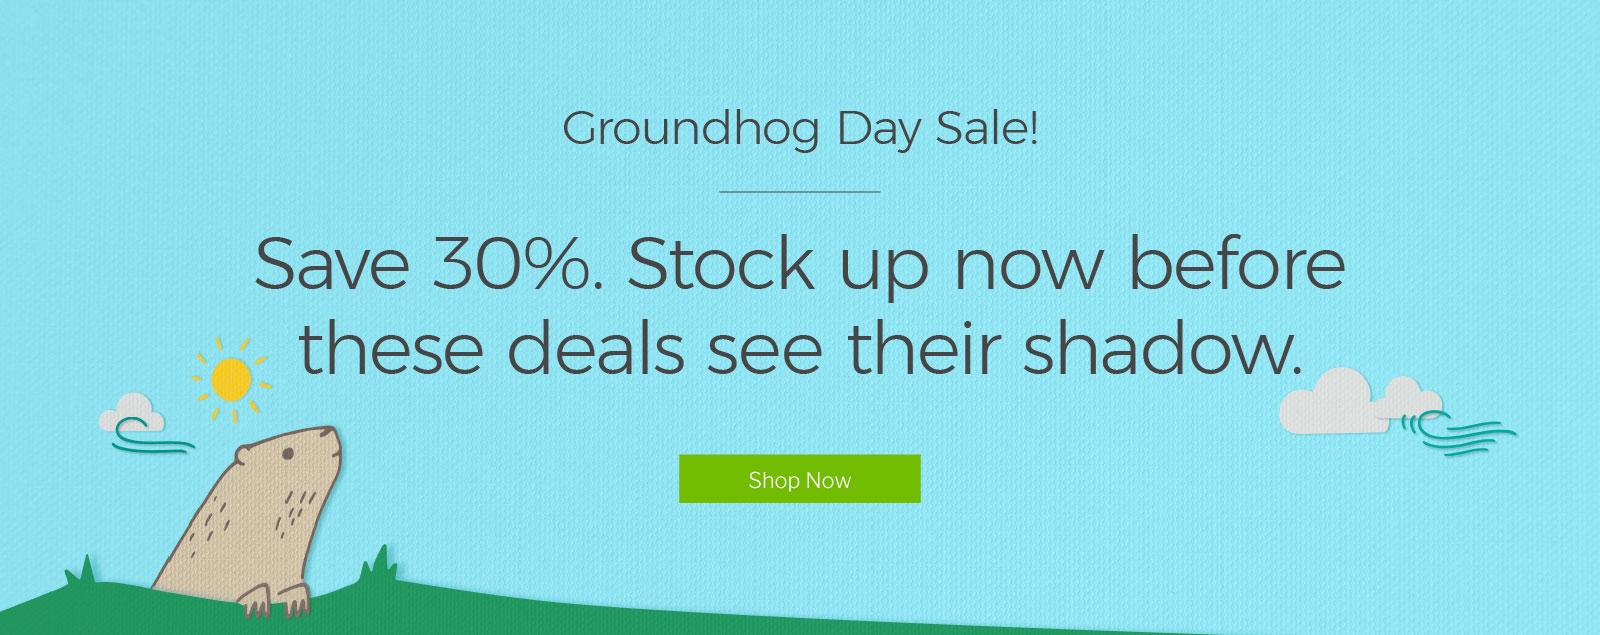 Cricut: Groundhog Day Sale! - Lovin' the Prize of Life